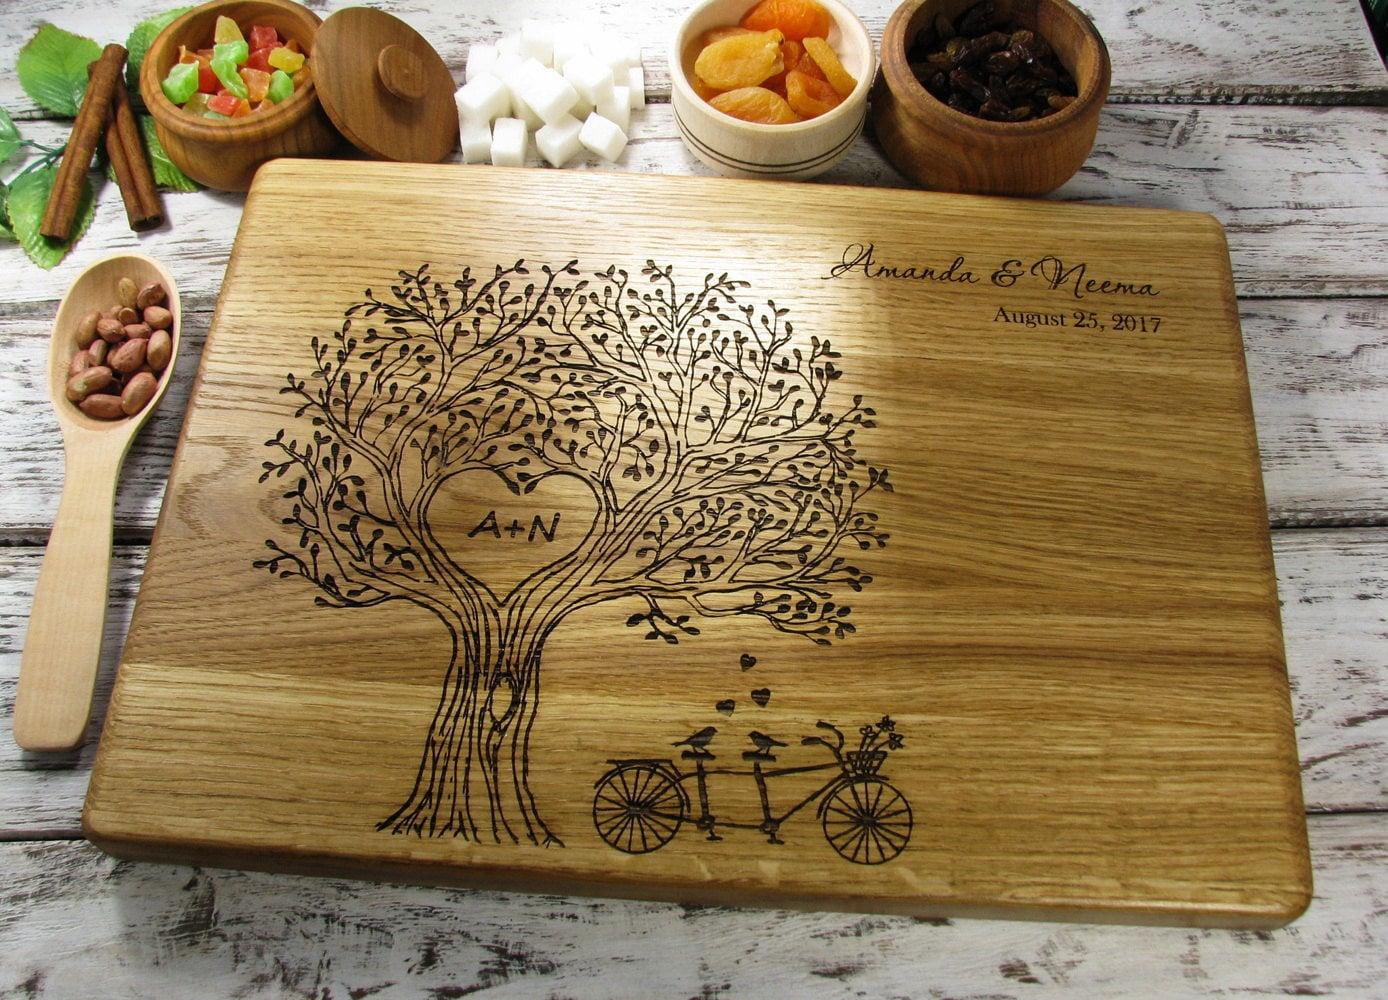 Wedding Gift Cutting Board: Personalized Cutting Board Wedding Gift Cutting Board